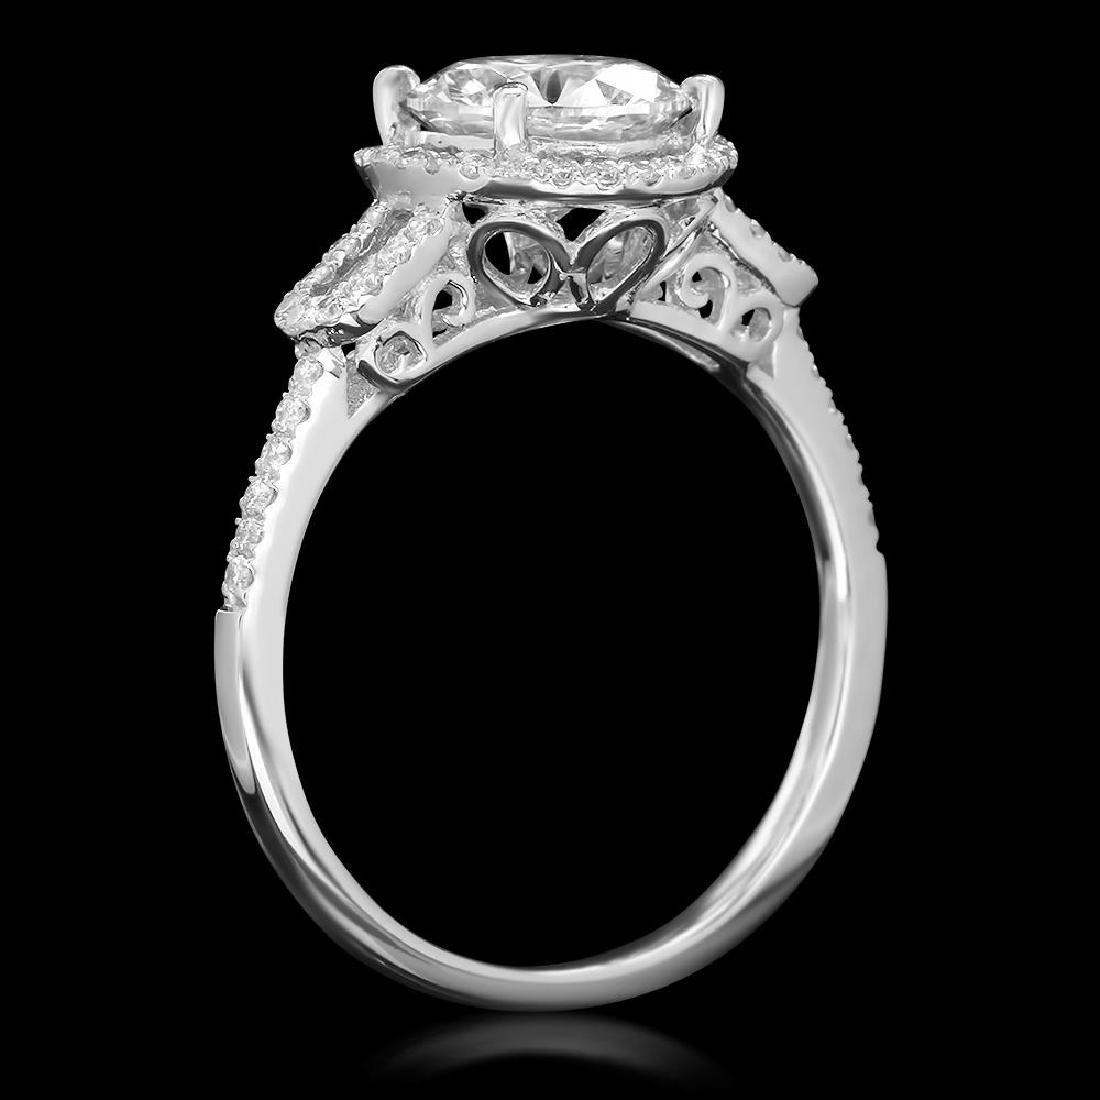 14K Gold 1.79ct Diamond Ring - 2